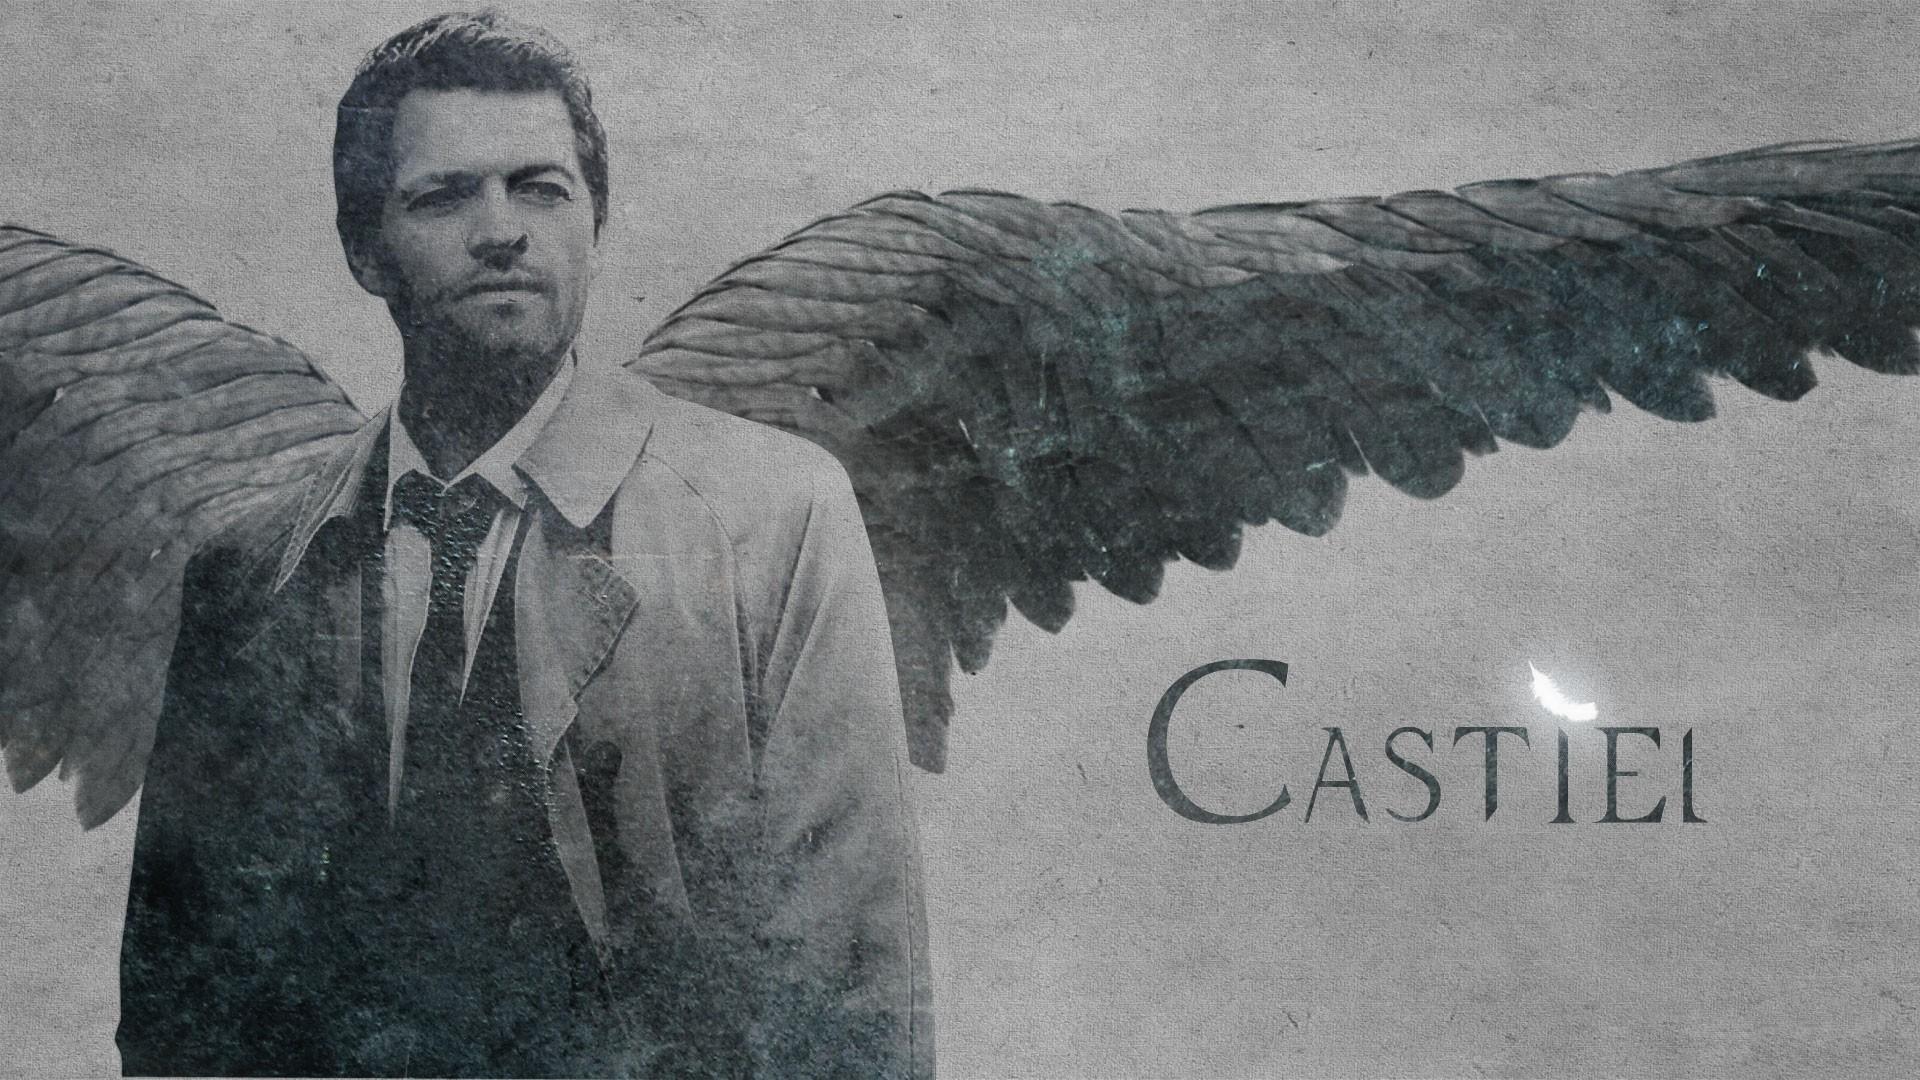 Castiel Supernatural Iphone Image Download Free.